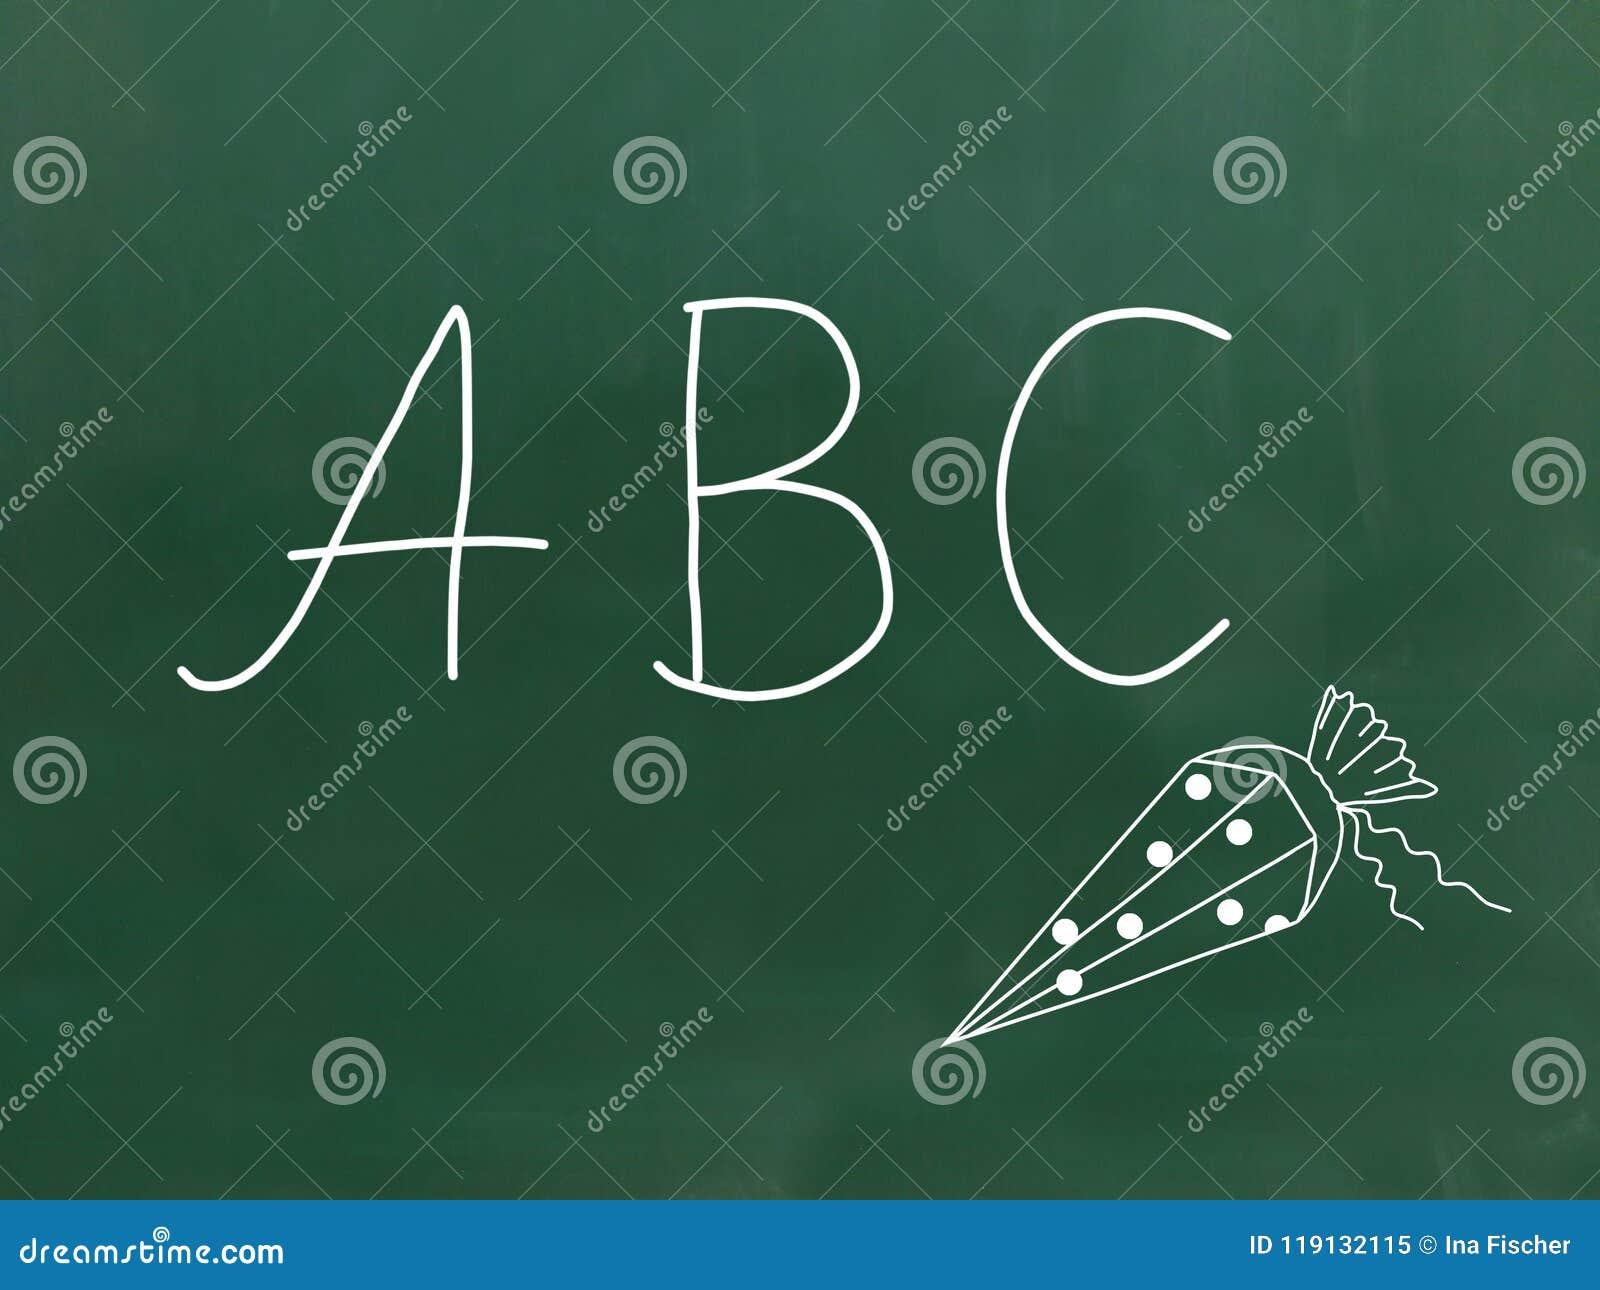 ABC - Listy na chalkboard